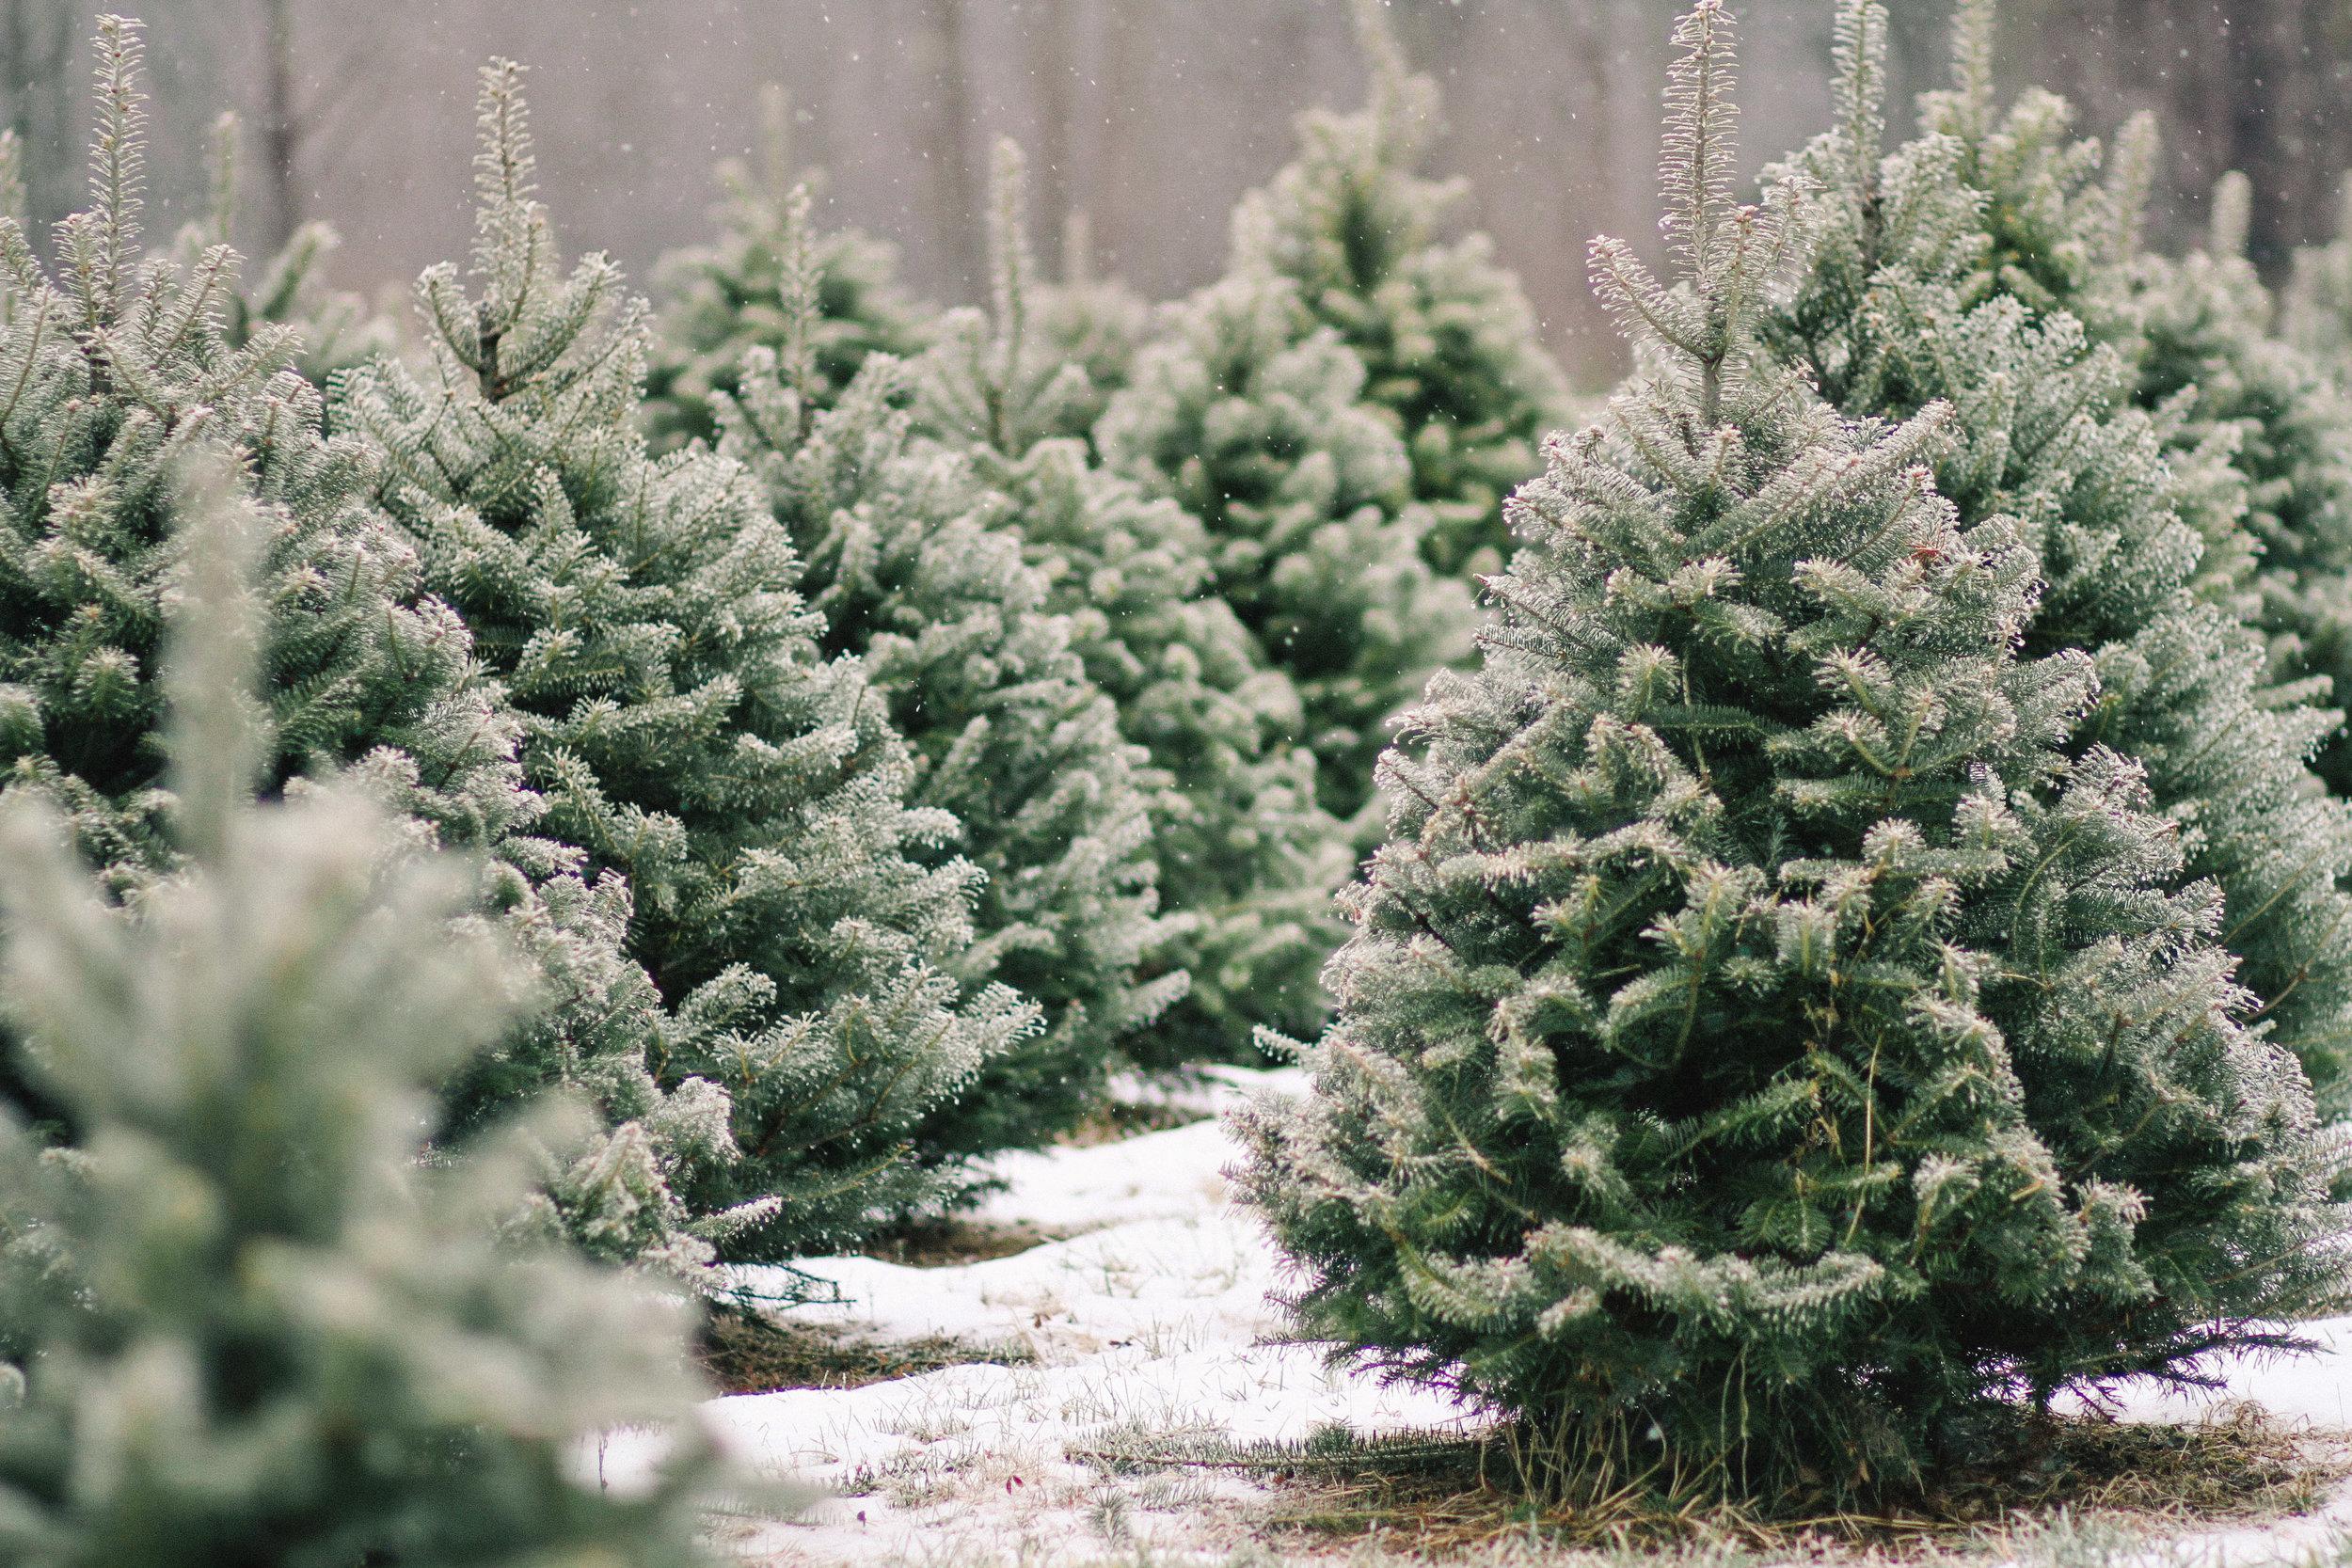 Christmas Tree Farm Pictures.Redland Family Farm U Cut Christmas Trees And Holiday